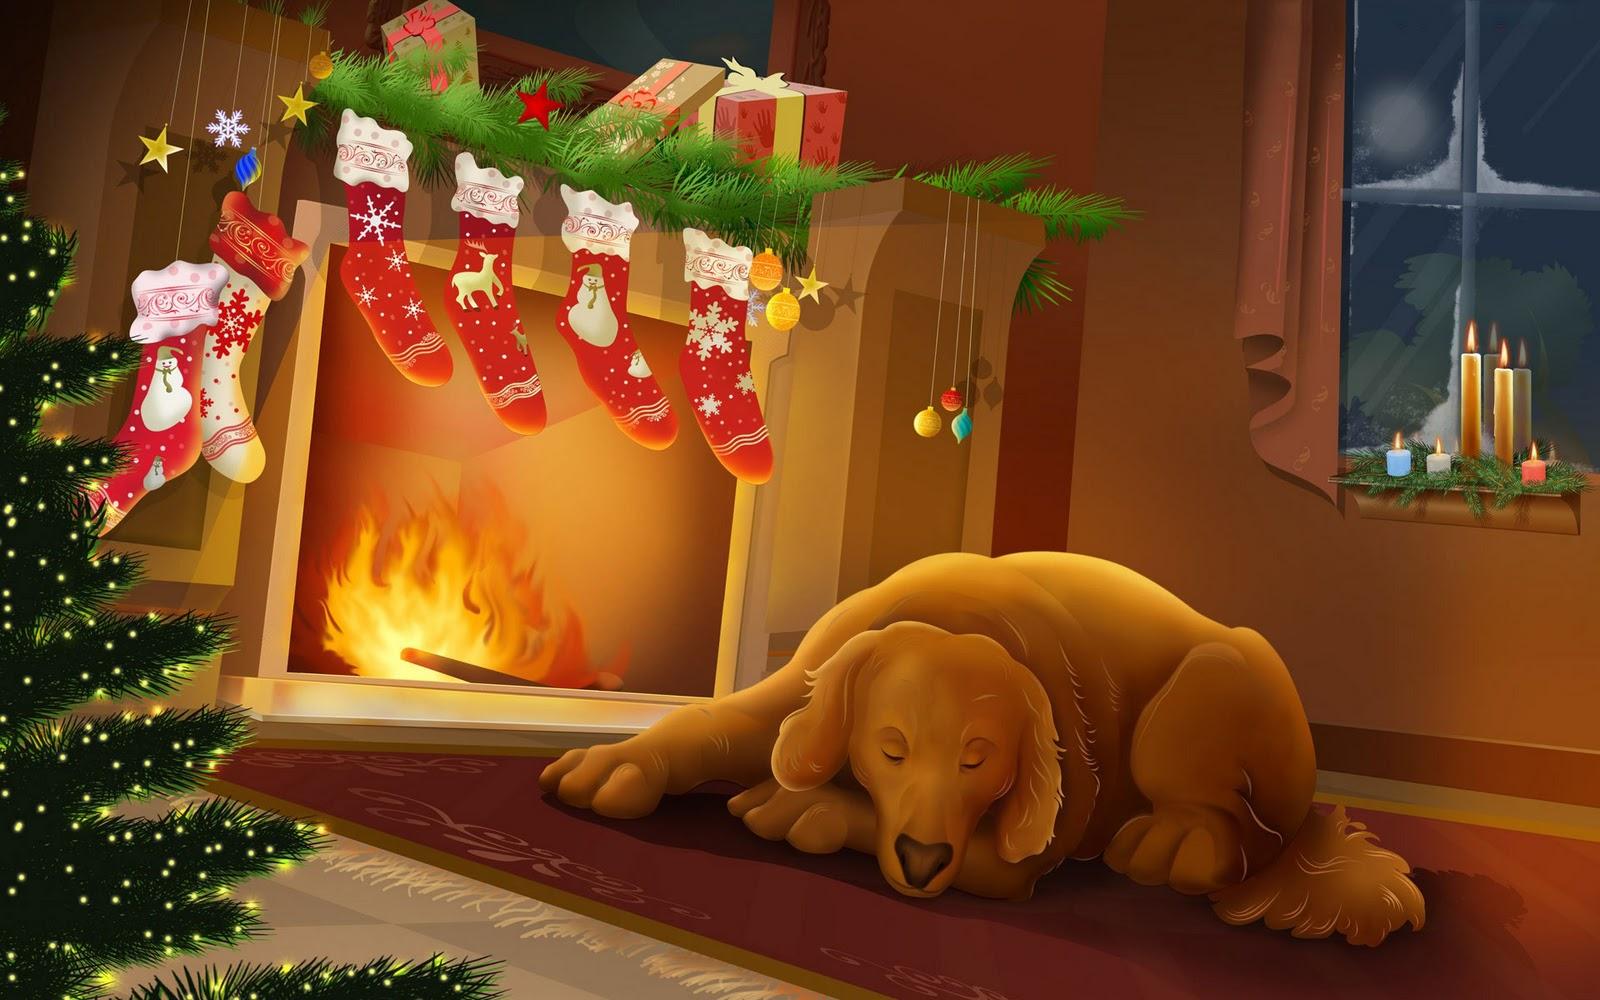 http://1.bp.blogspot.com/-WdhSTwkk6iE/TvXplmAdrvI/AAAAAAAAATM/JYQVXTTV3gU/s1600/ChristmasWallpapers.jpg